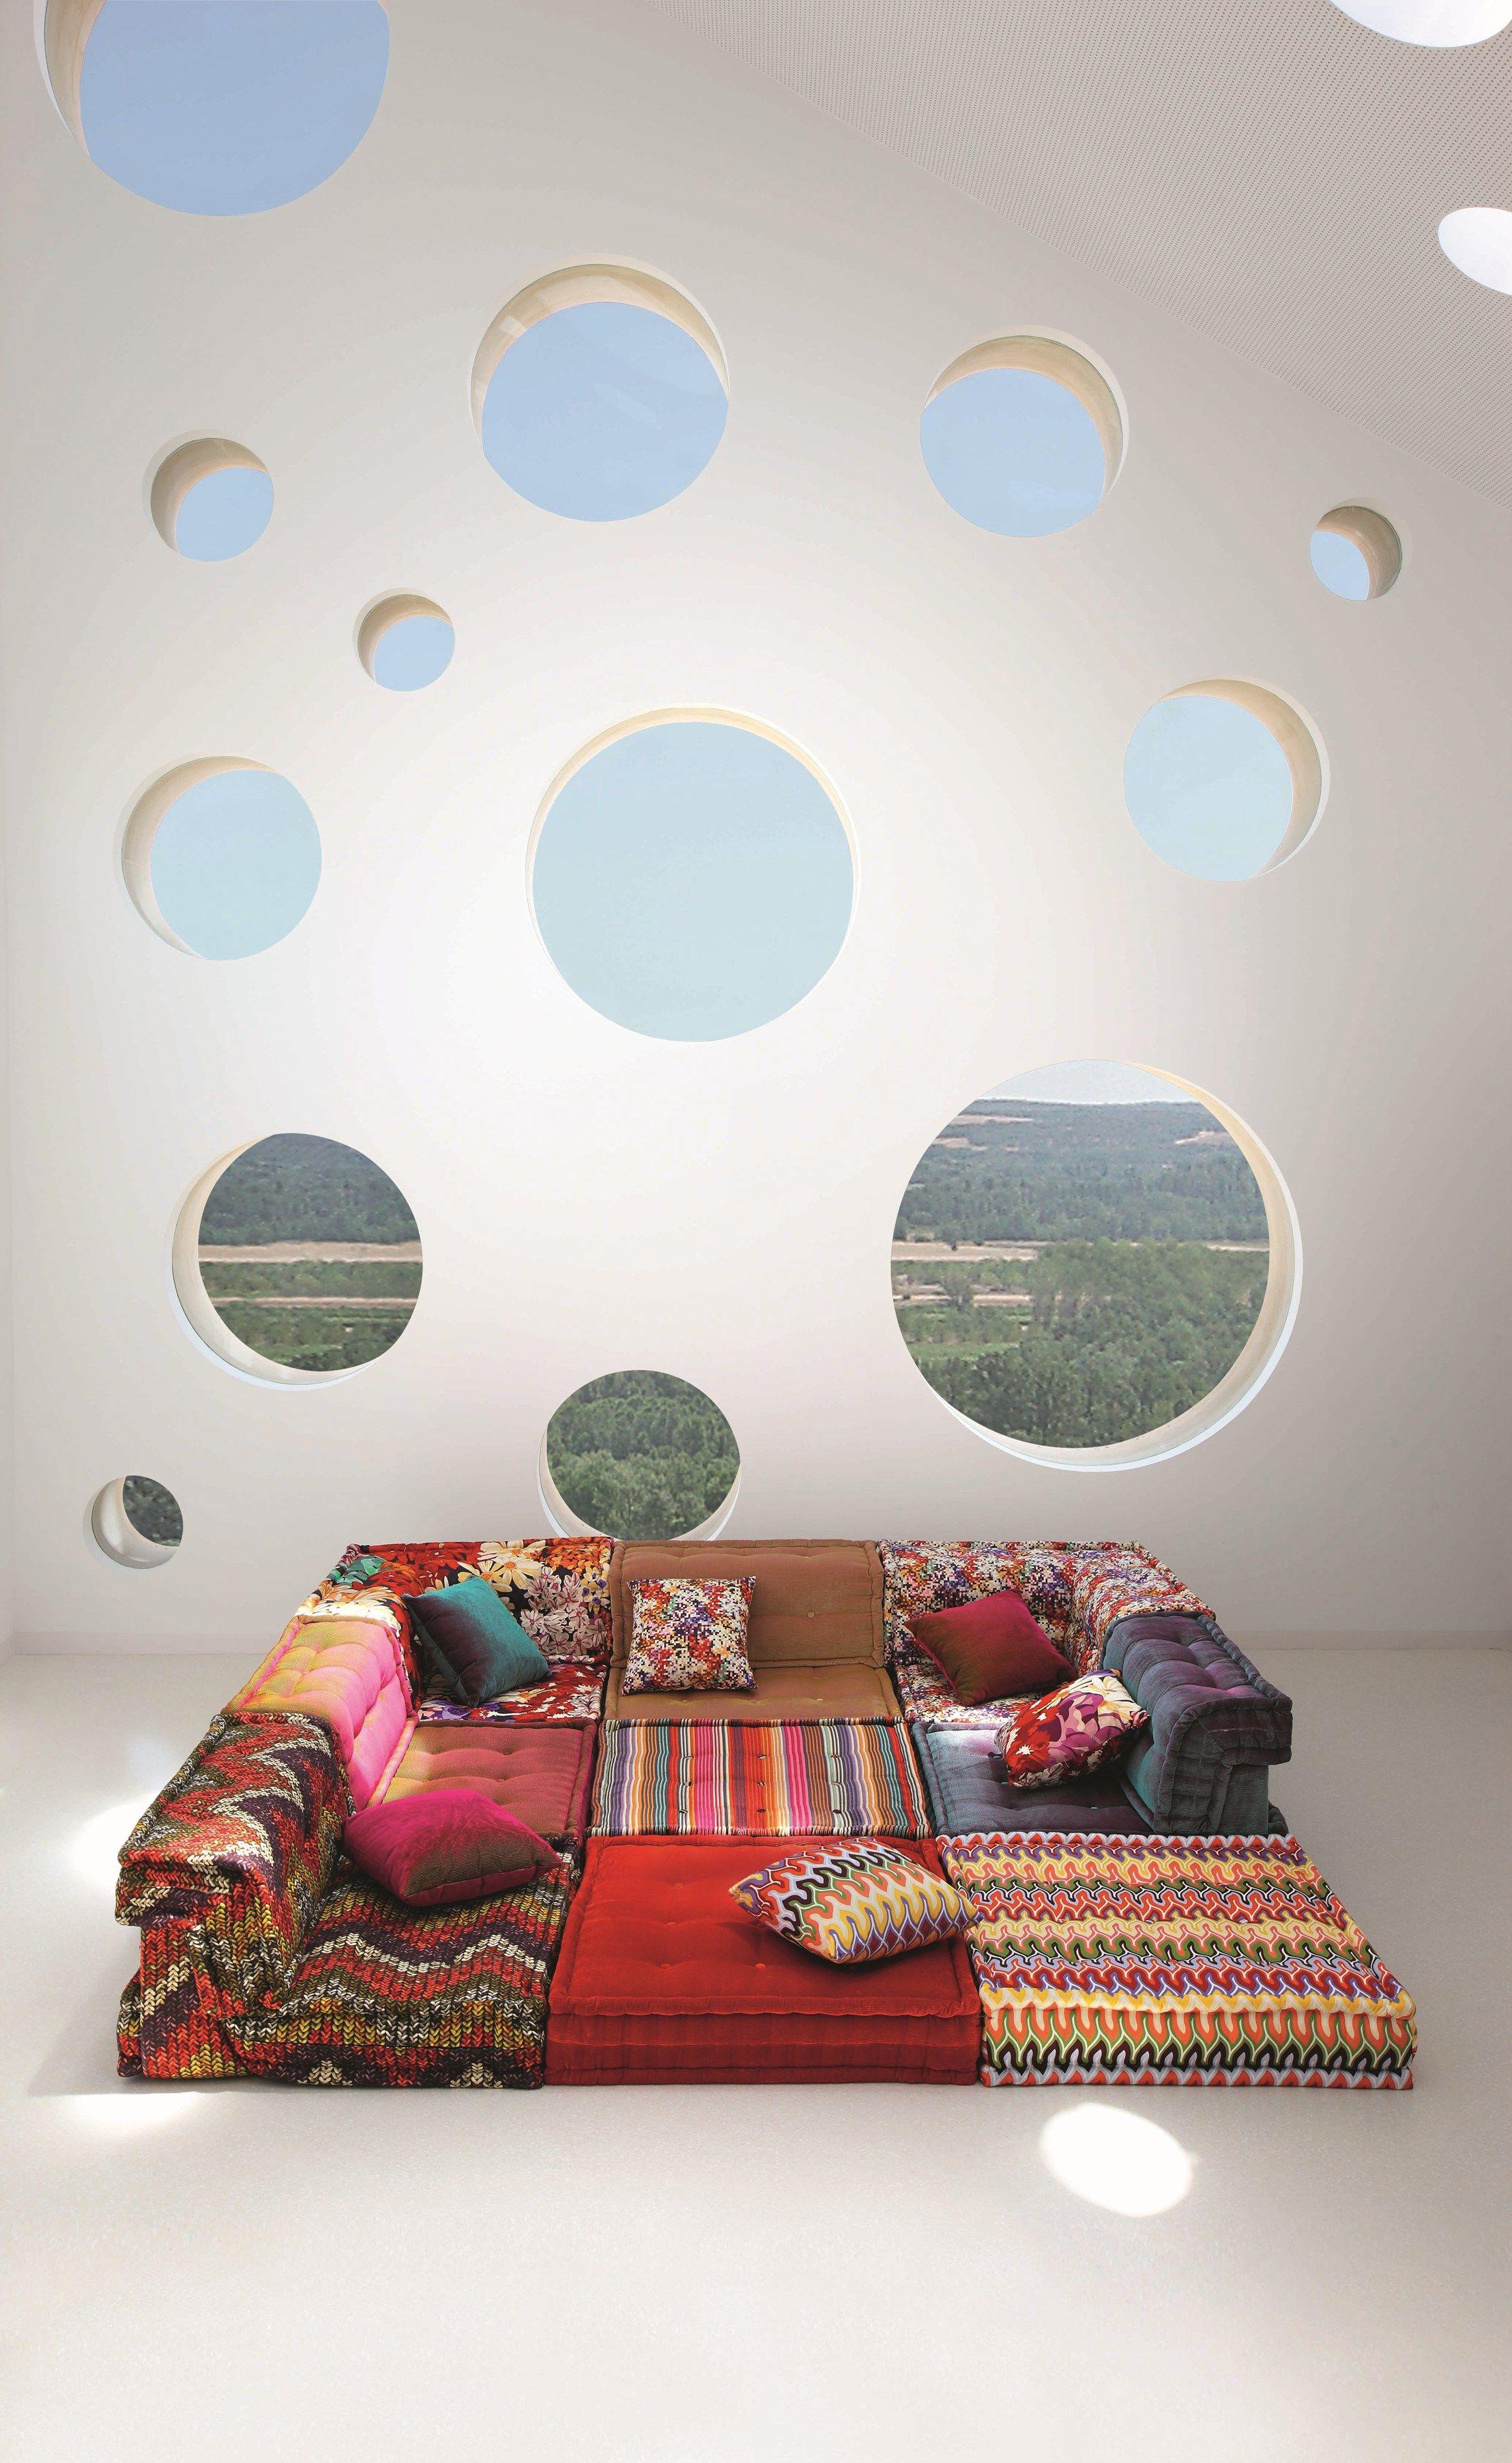 canap composable en tissu mah jong missoni home by roche bobois design hans hopfer. Black Bedroom Furniture Sets. Home Design Ideas